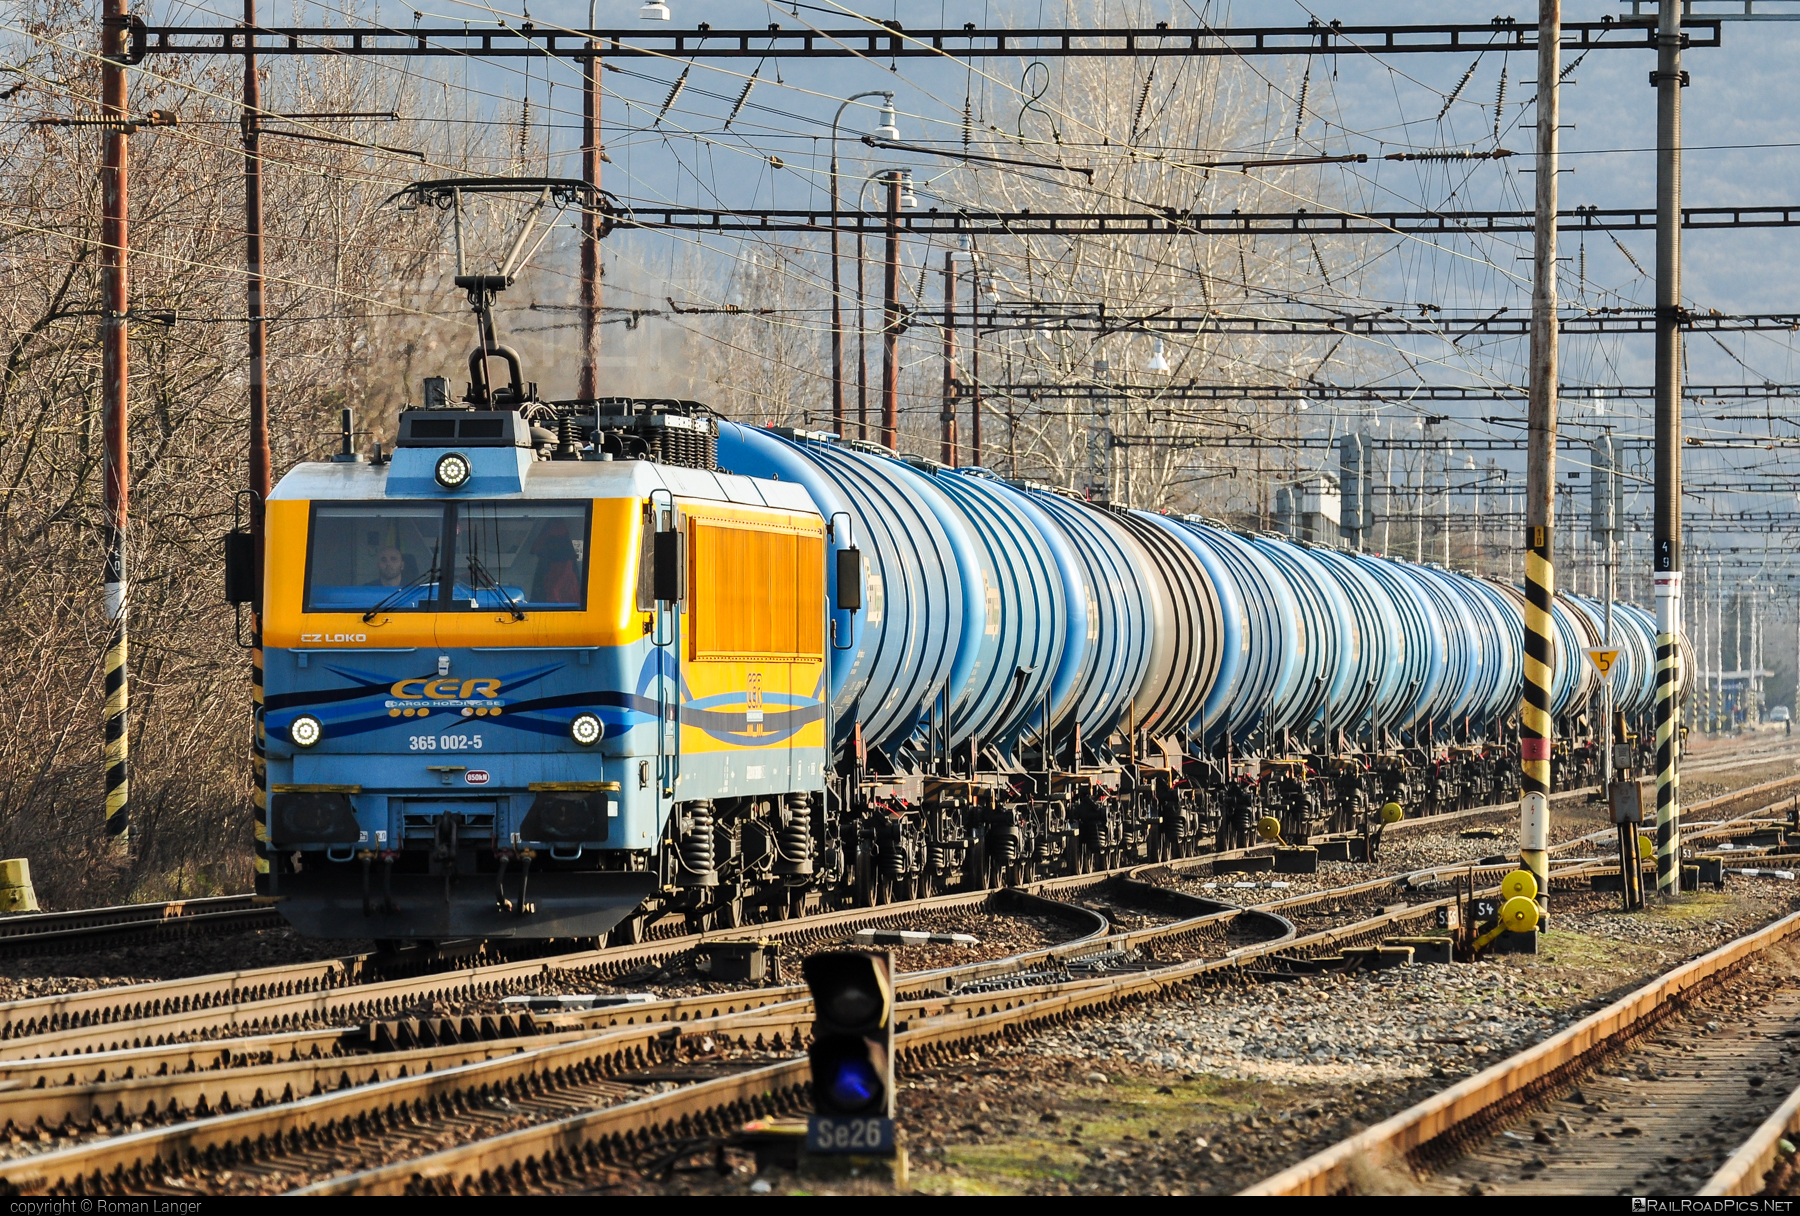 CZ LOKO EffiLiner 3000 - 365 002-5 operated by CER Slovakia a.s. #belgicanka #cer #cersk #cerslovakia #cerslovakiaas #czloko #czlokoas #effiliner #effiliner3000 #kesselwagen #sncb12 #sncbclass12 #tankwagon